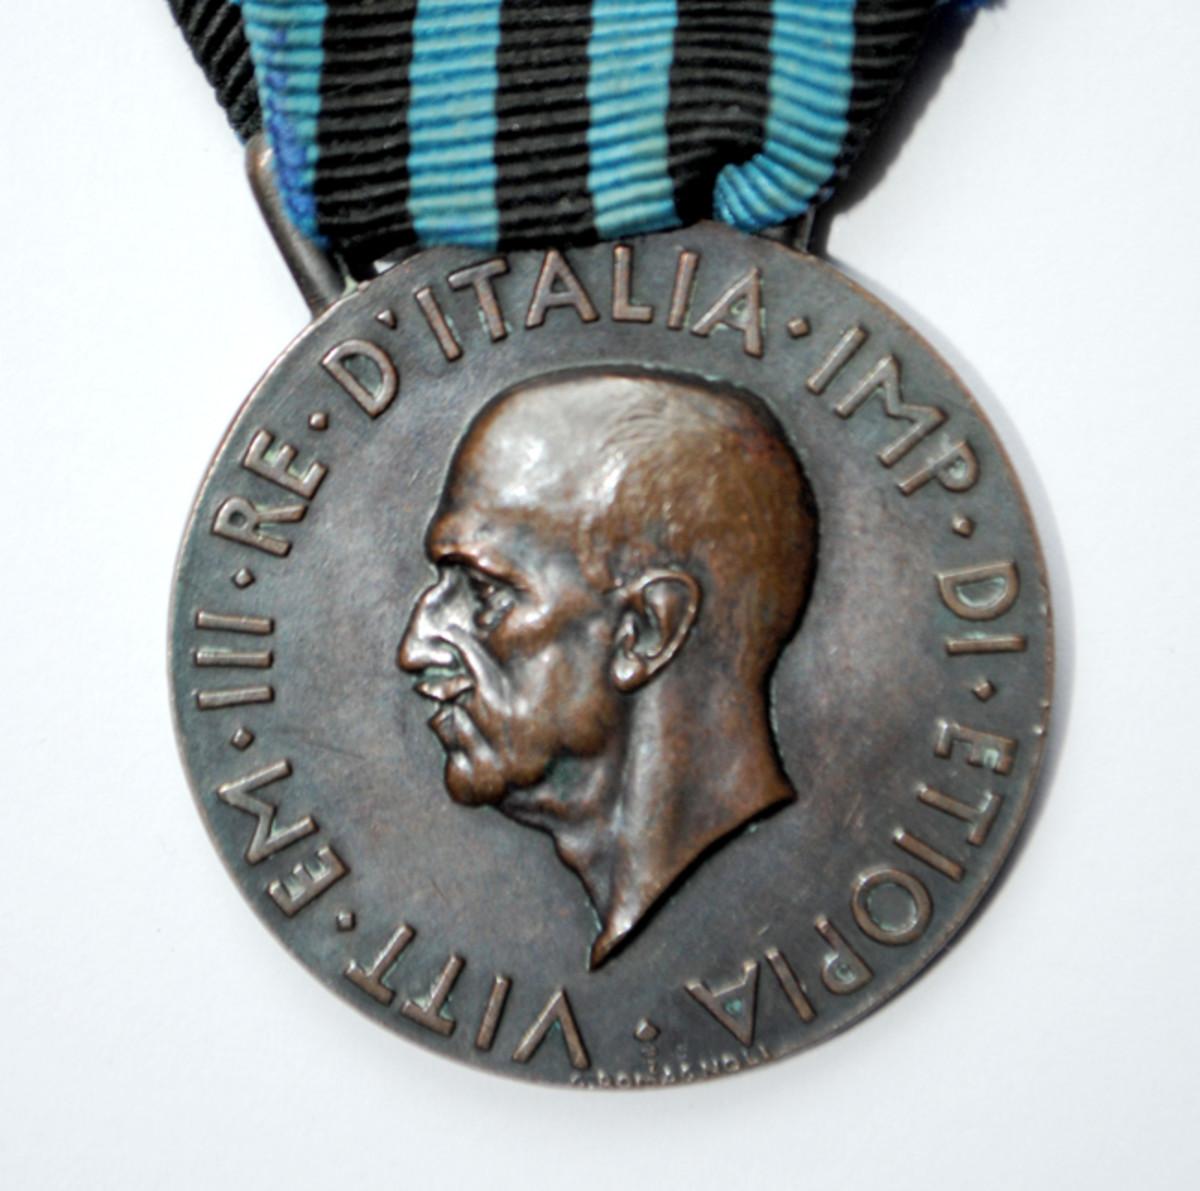 Obverse showing profile of King Victor Emanuele III.